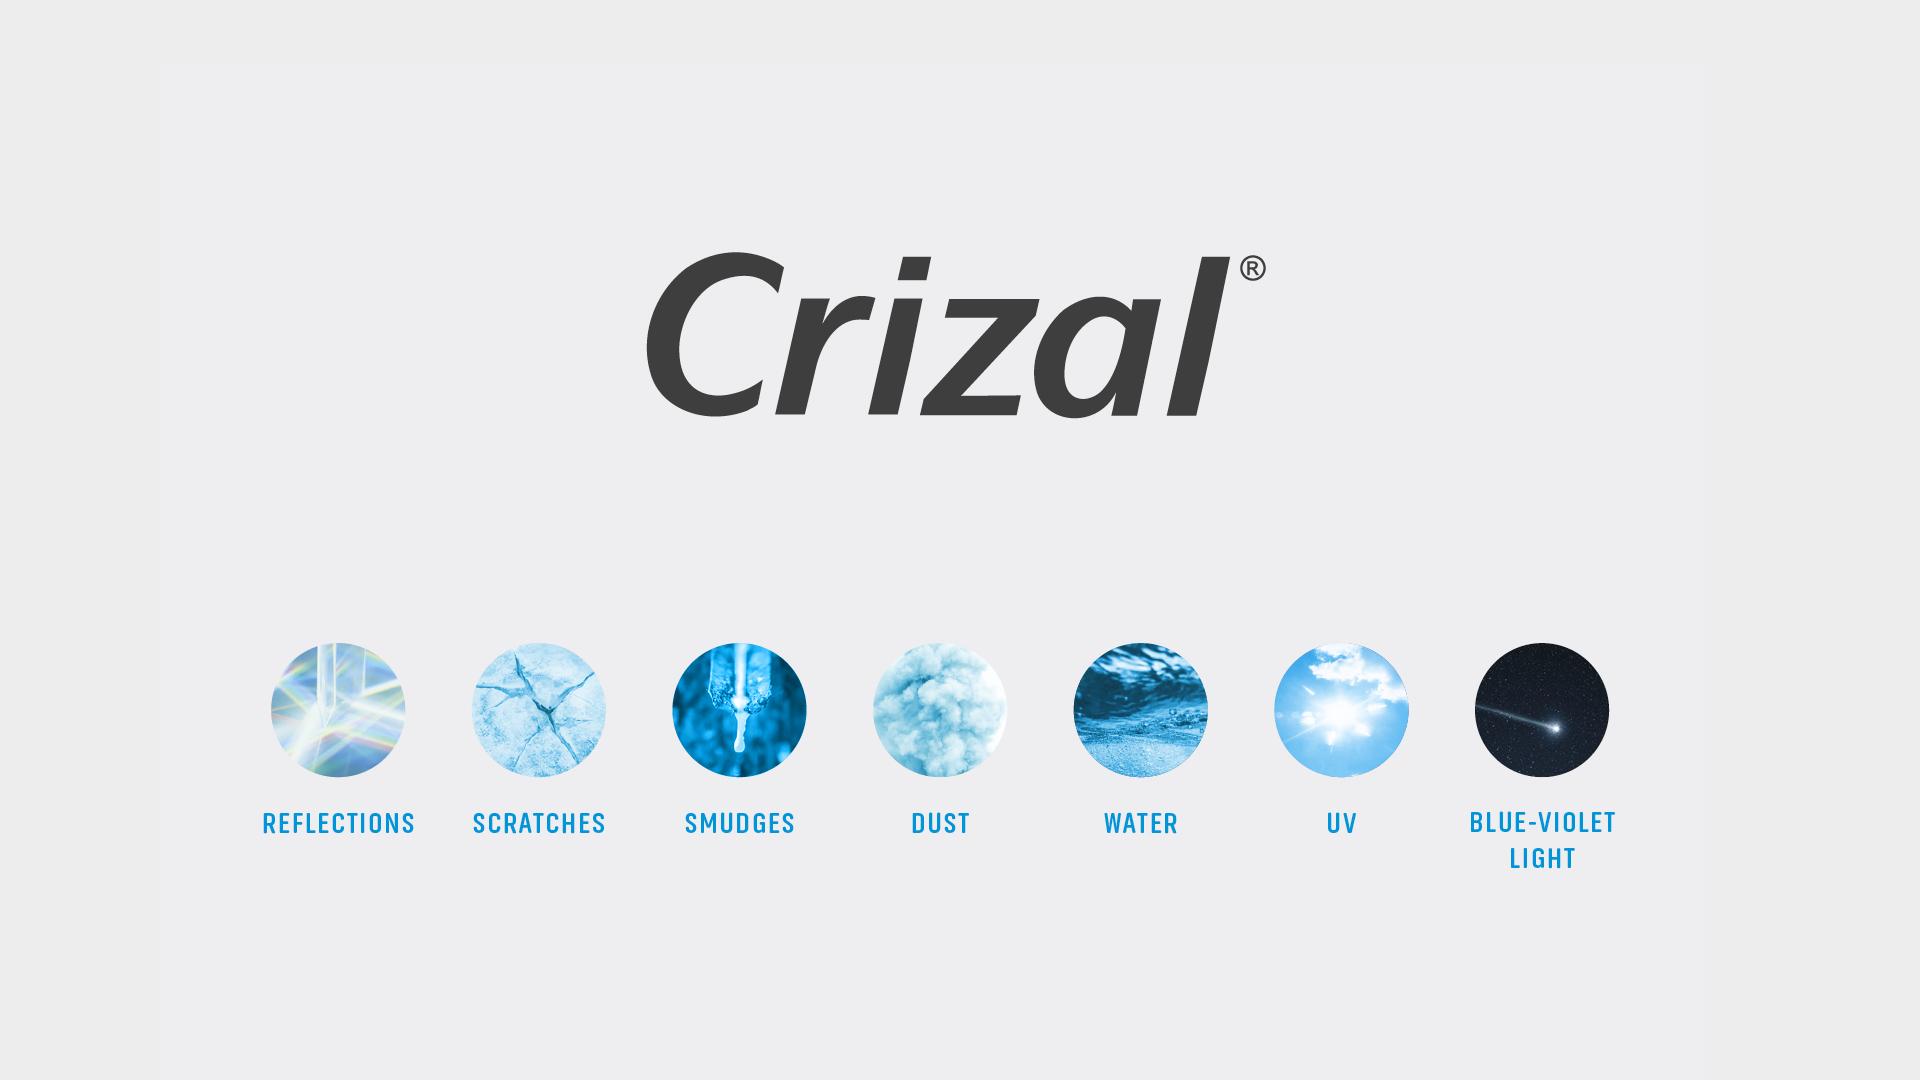 crizal_casclient2